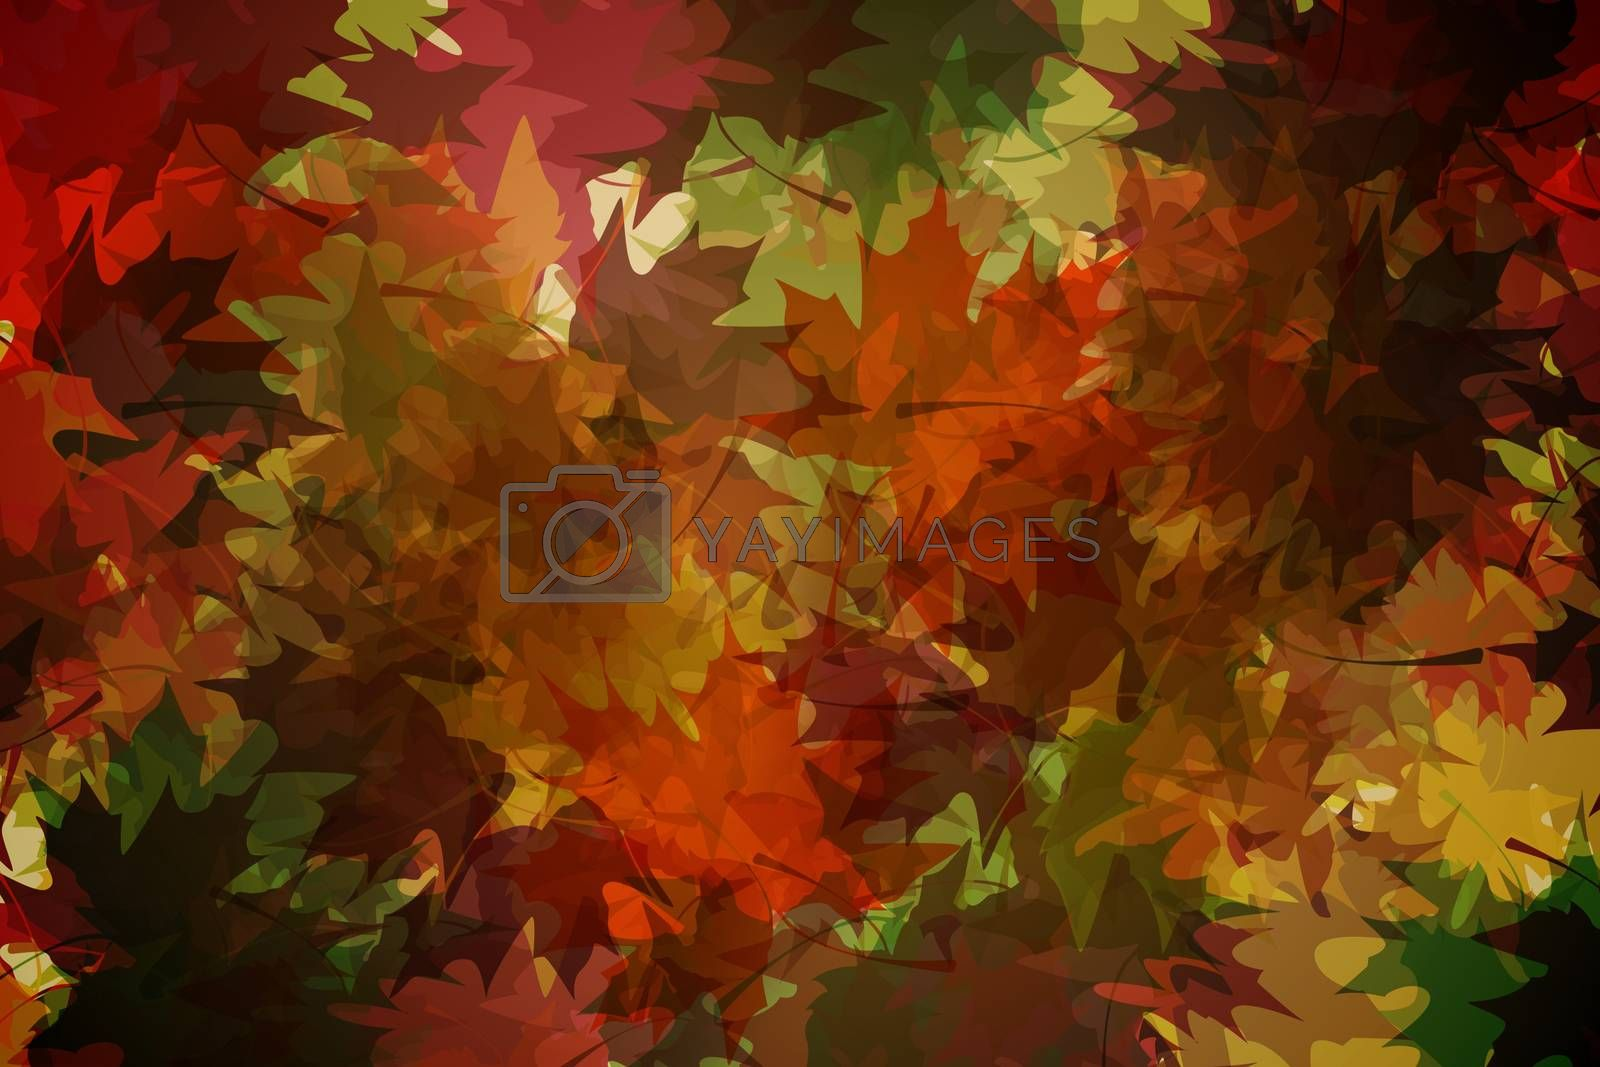 Royalty free image of Autumnal leaf pattern in warm tones by Wavebreakmedia